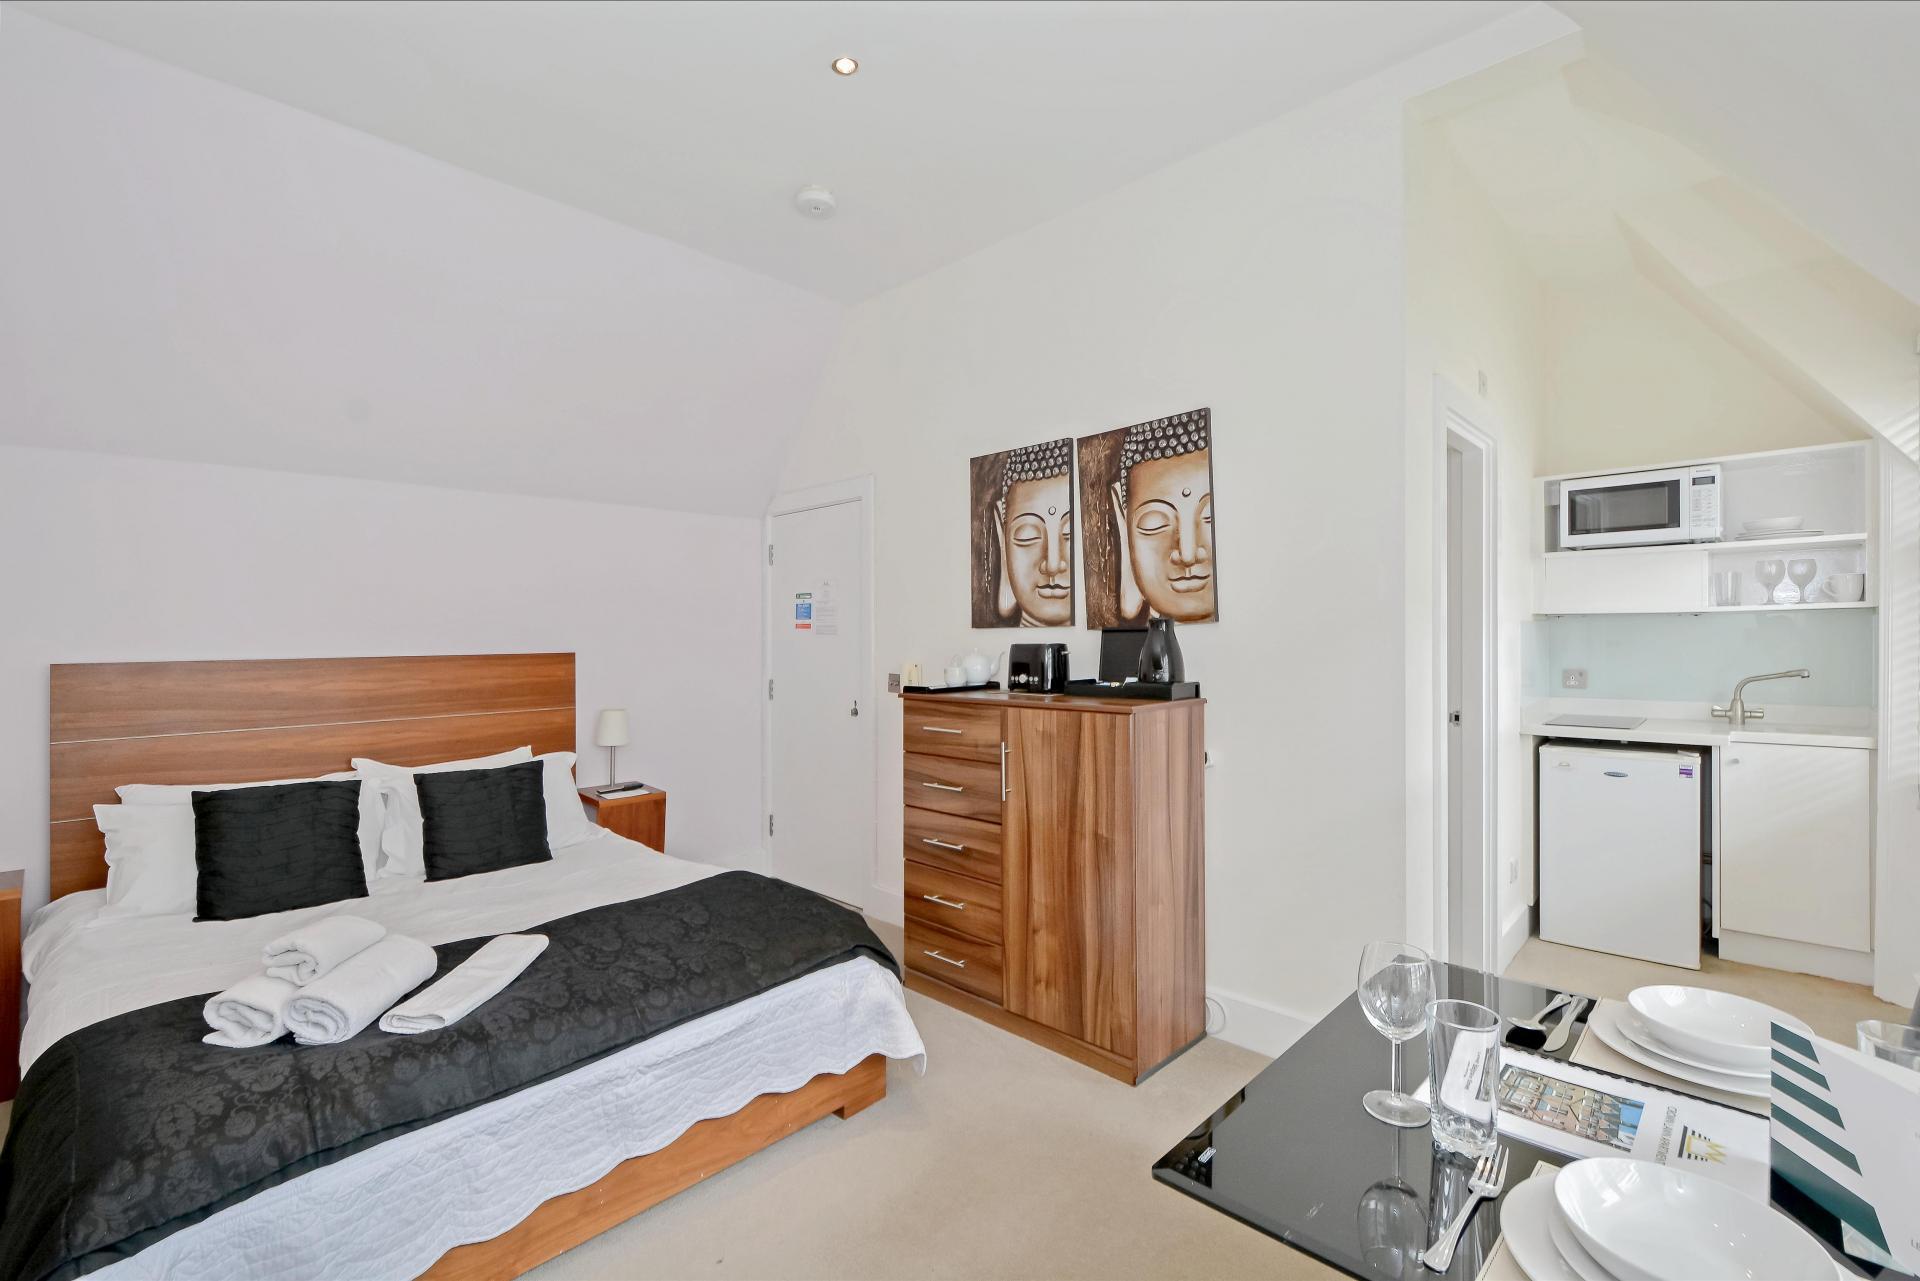 Black bed at LBS Apartments, Victoria, London